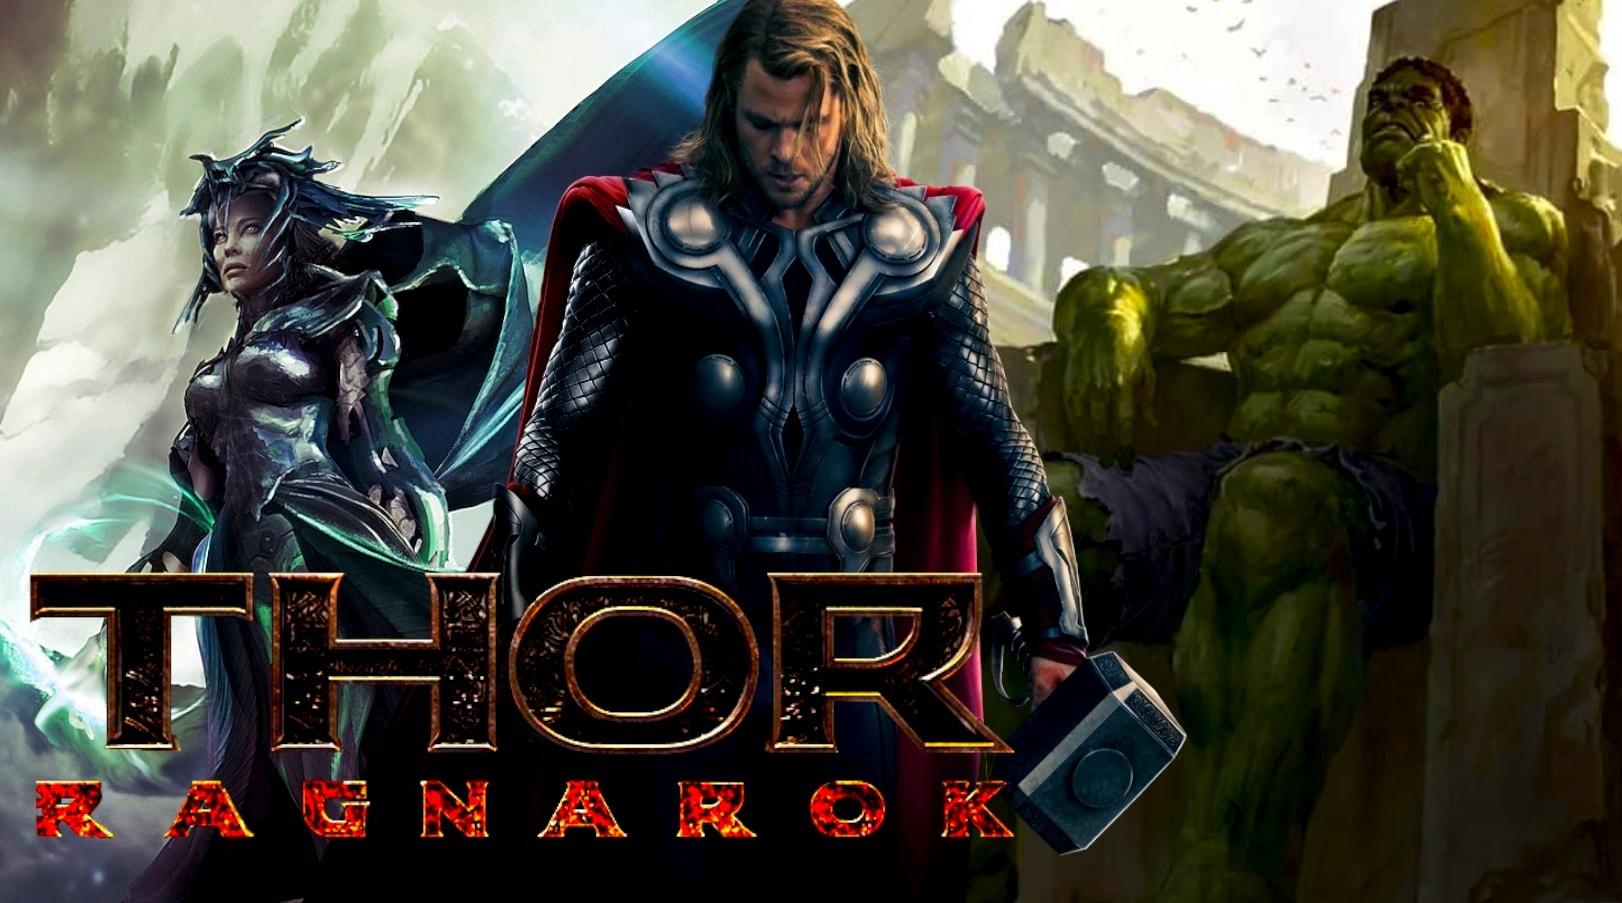 Thor: Ragnarok Pictures